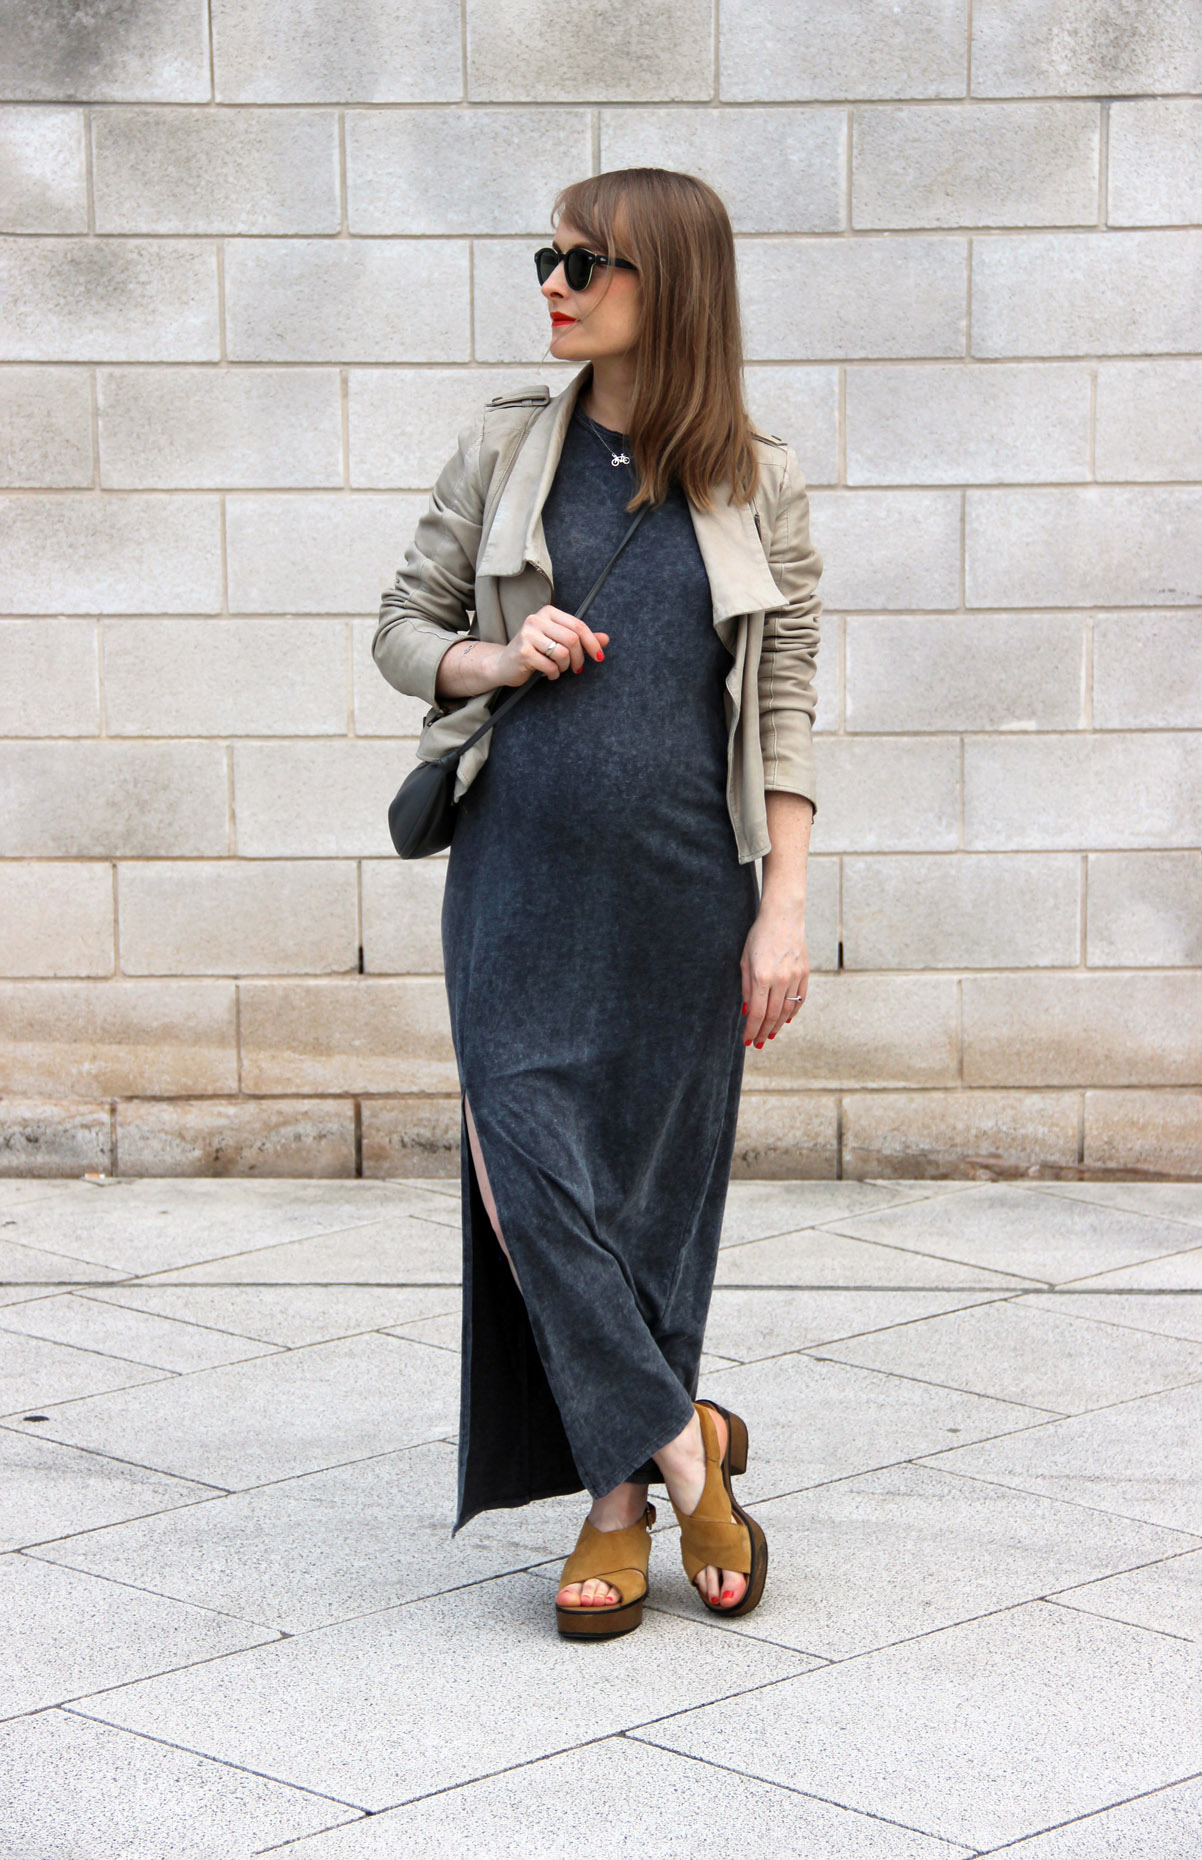 pregnant life pregnancy by Fashion Art Media